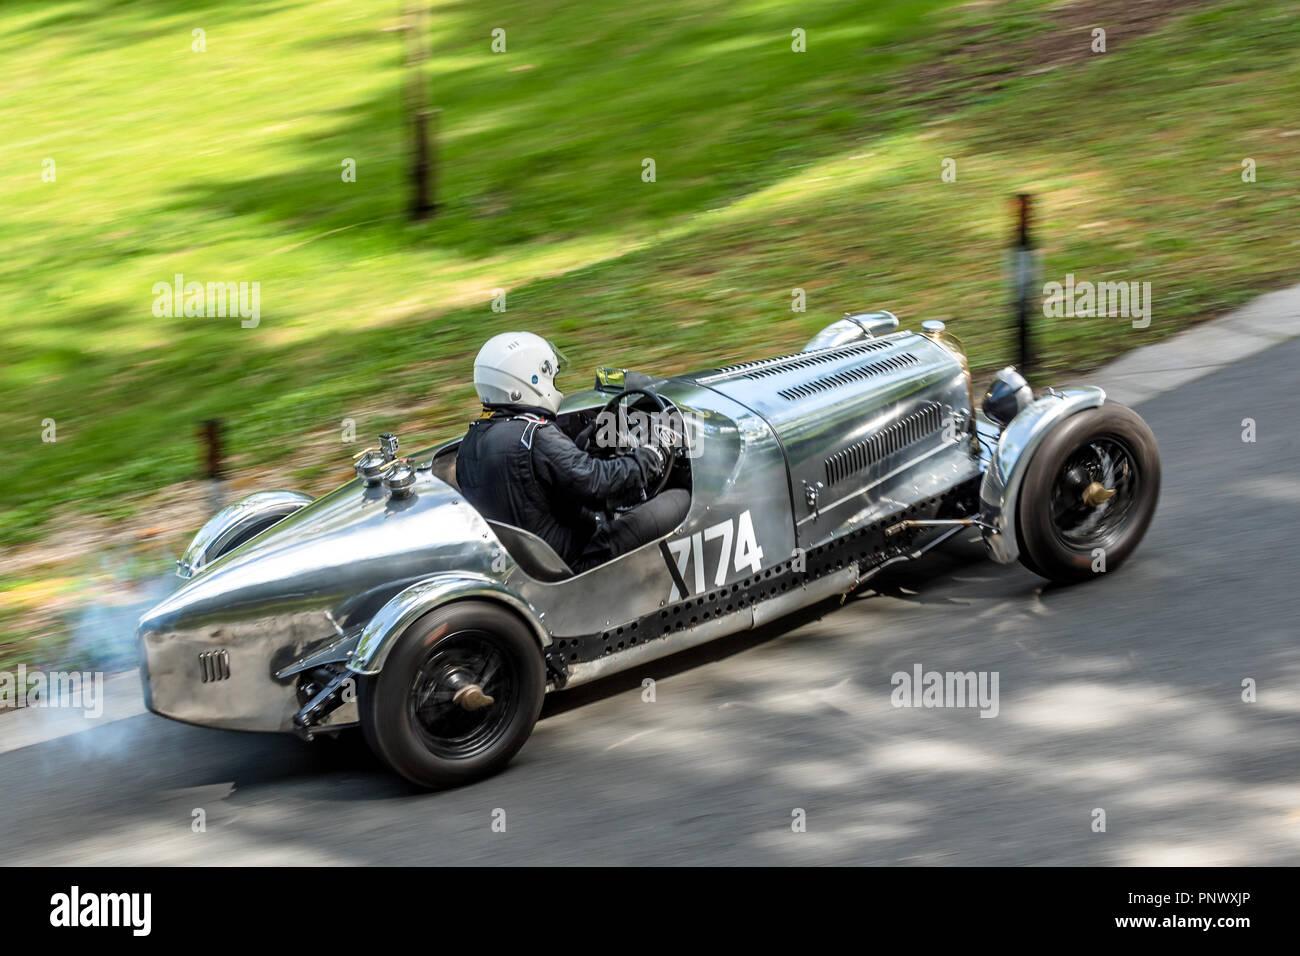 1937 Riley 9 - Stock Image